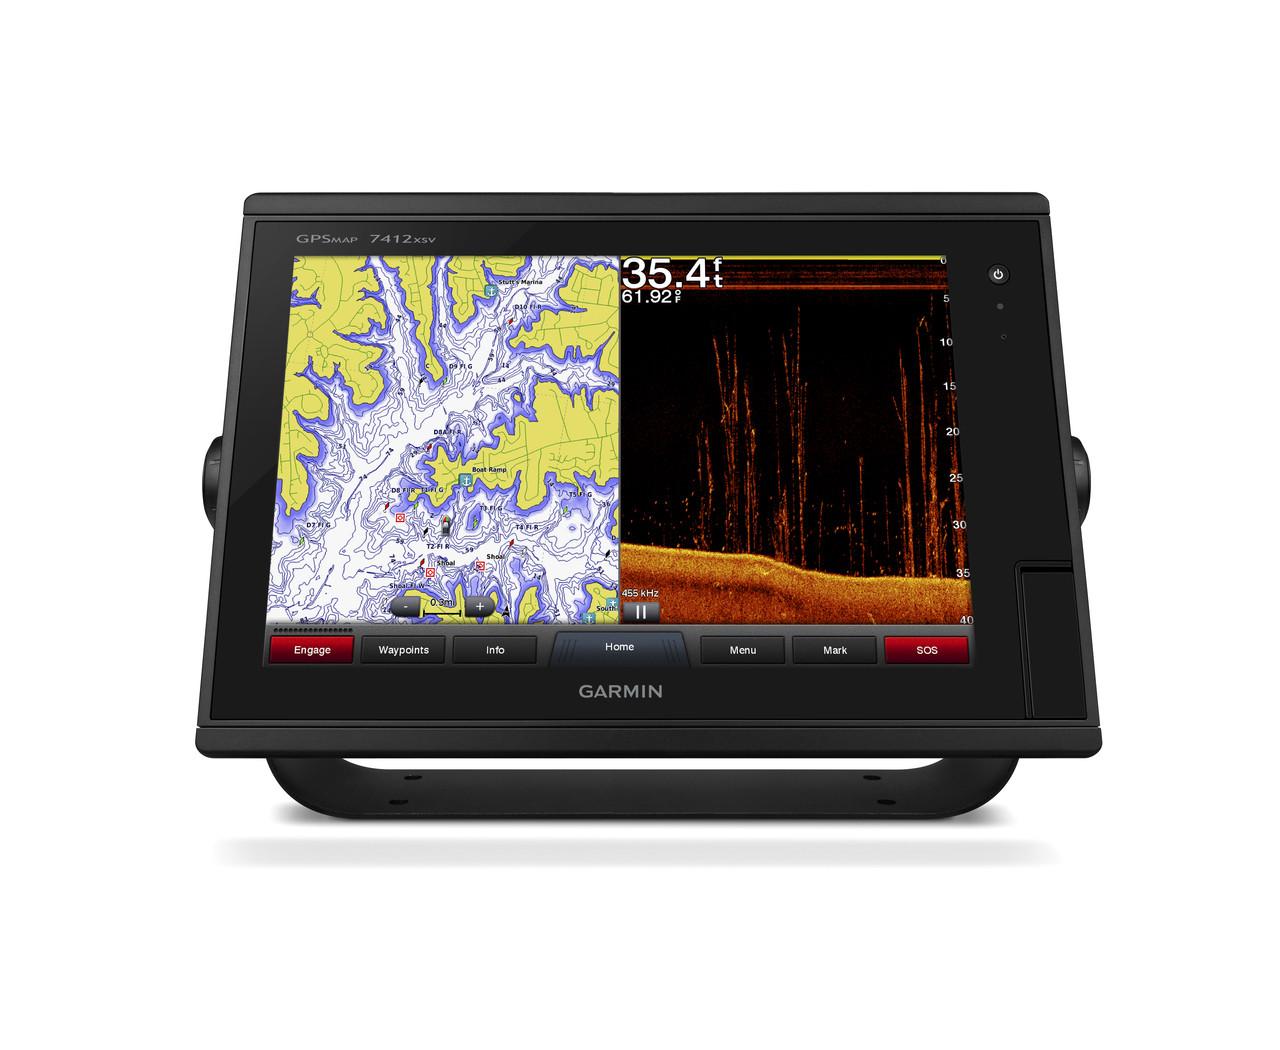 Garmin GPSMAP 7412xsv Front View